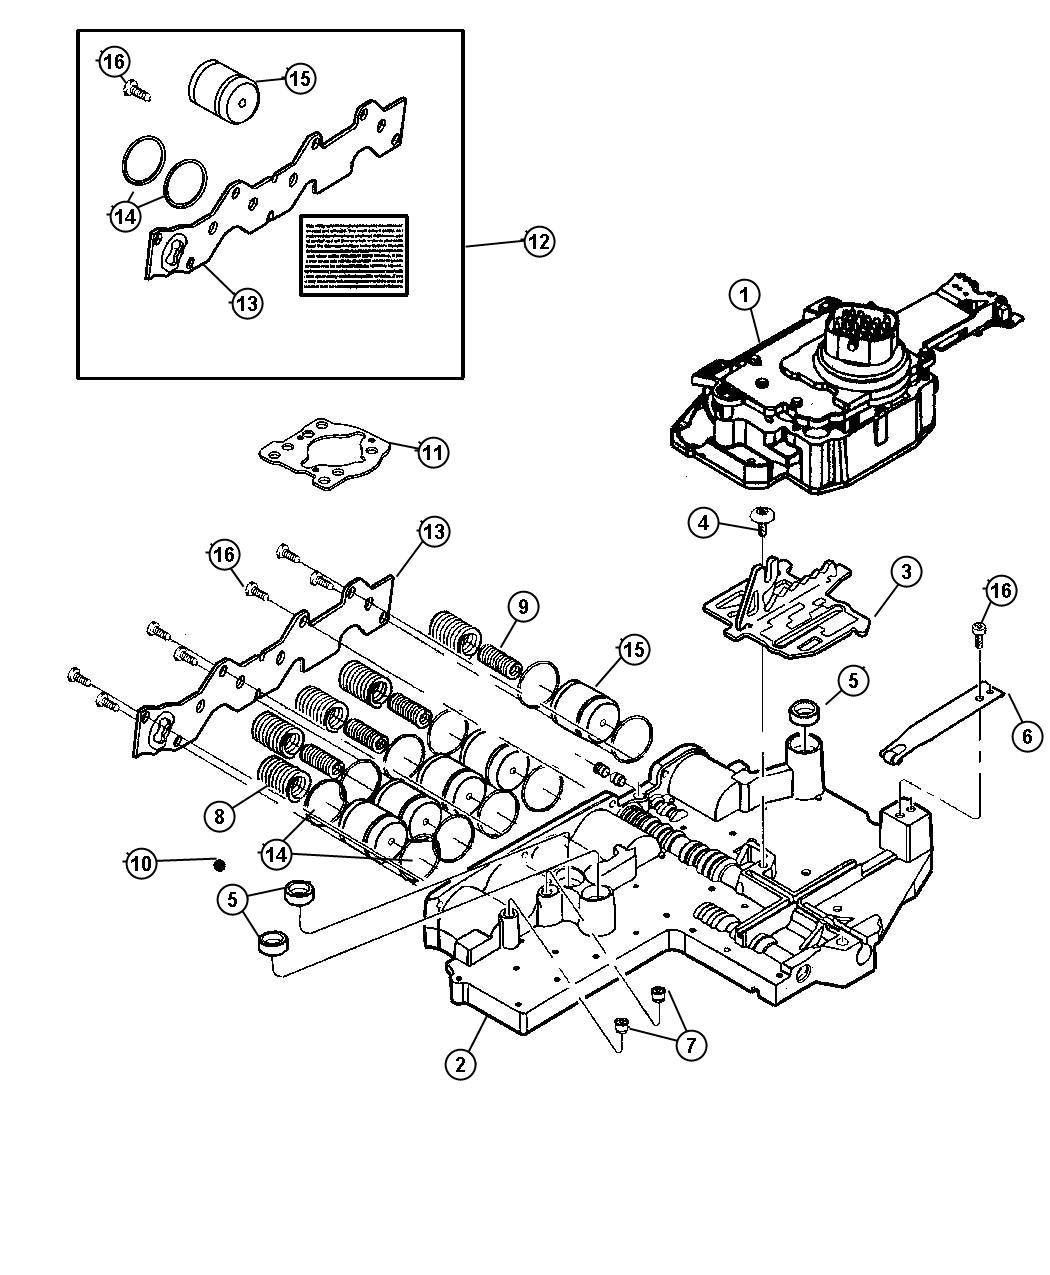 Jeep Liberty Solenoid Transmission